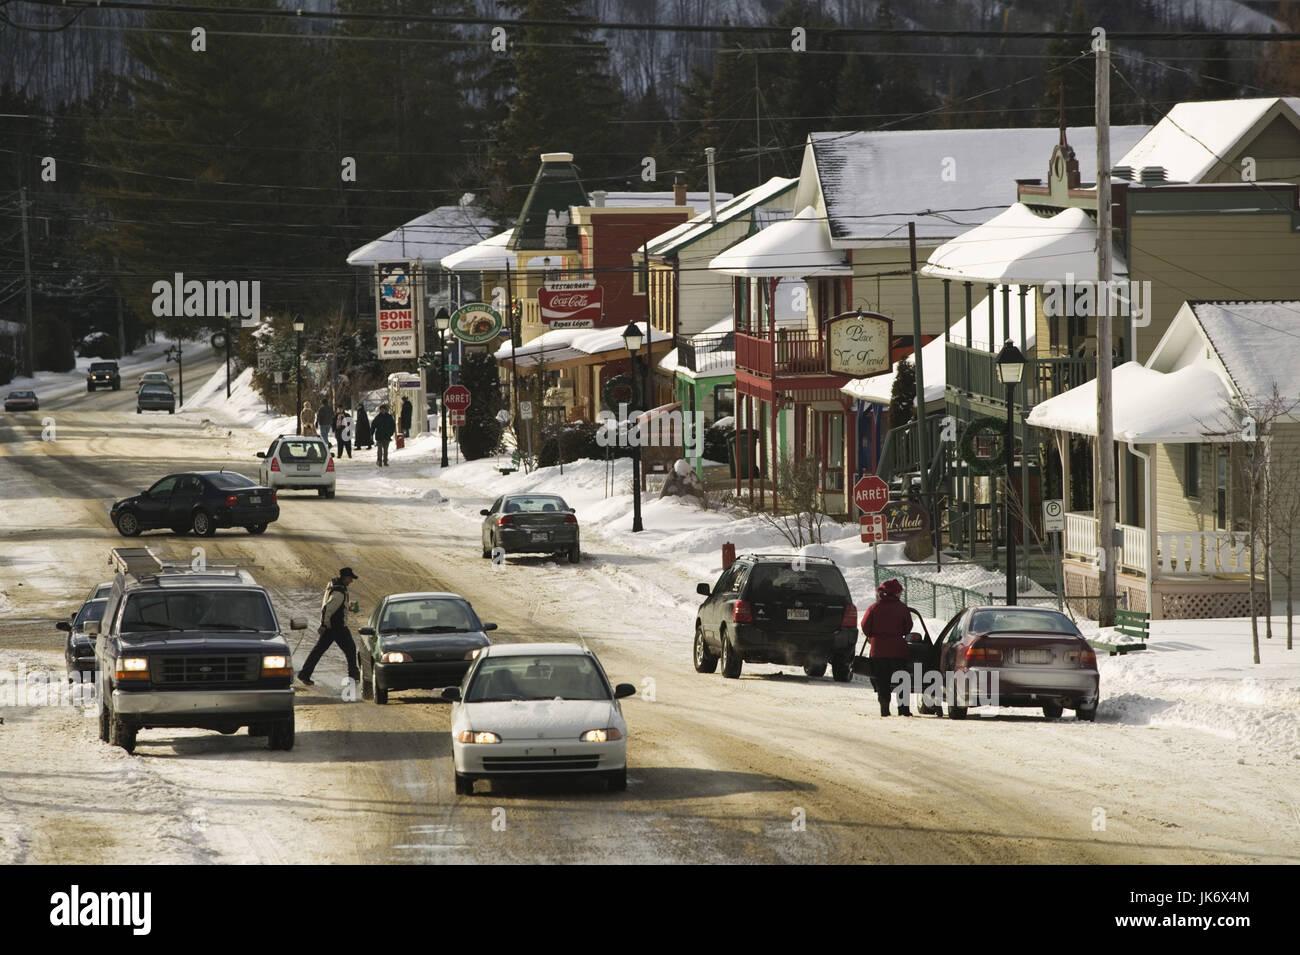 Kanada, Quebec, Laurentian Mountains, Val David, Straßenszene, Winter   Nordamerika, Canada, Laurentian Highlands, - Stock Image